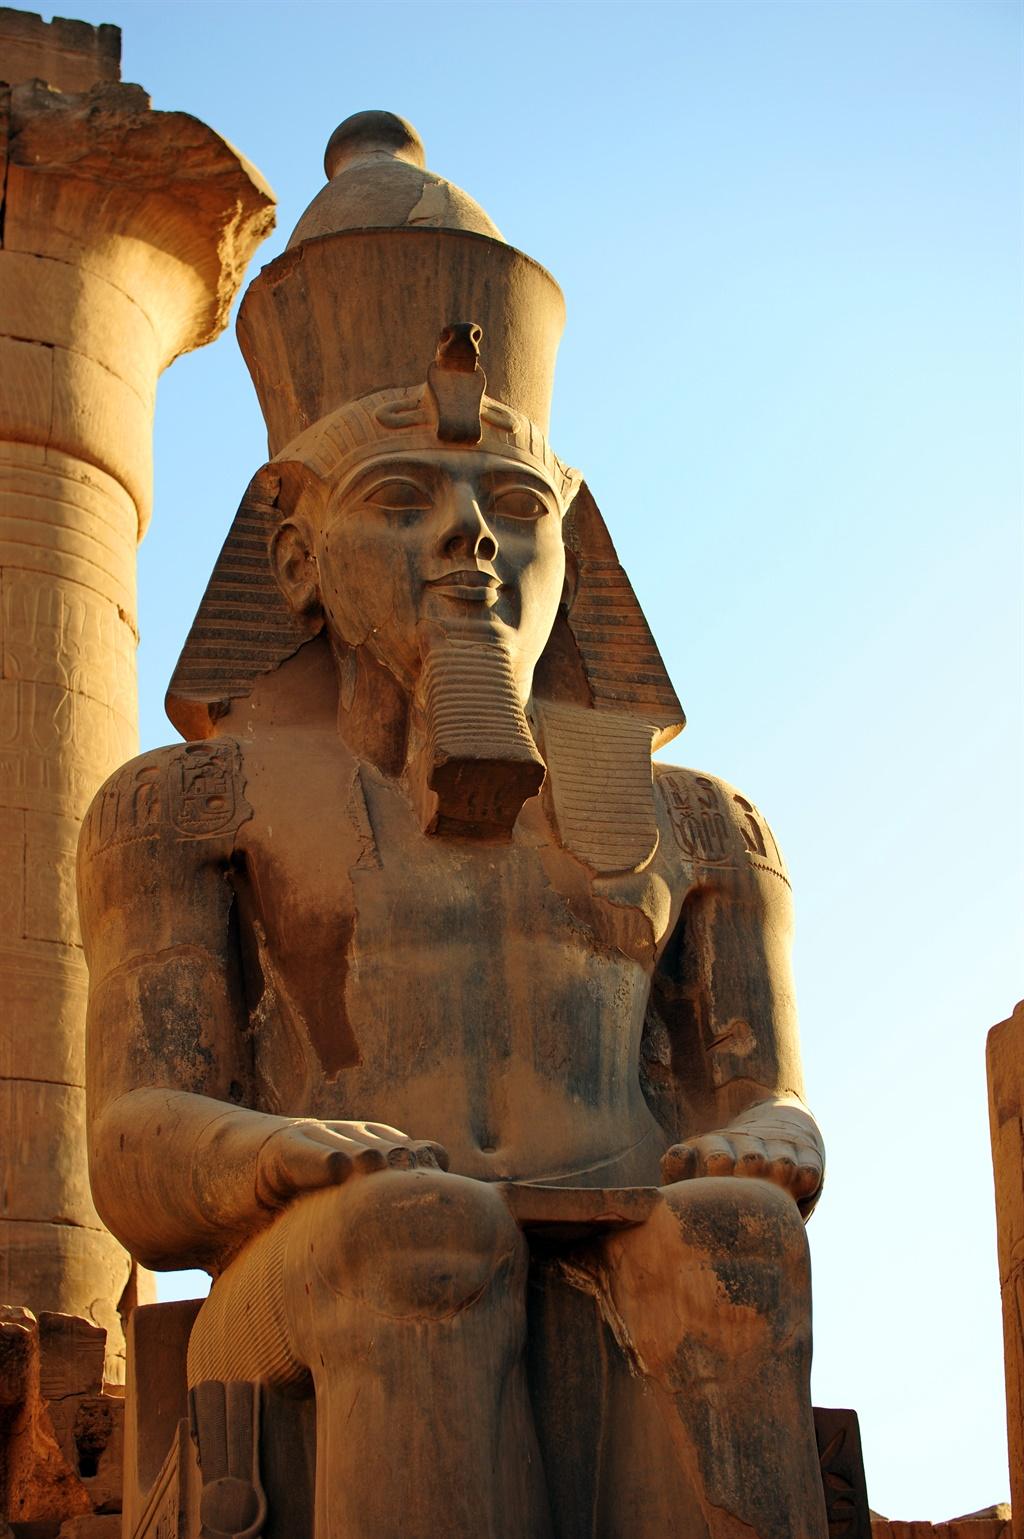 egipte,standbeeld,geskiedenis